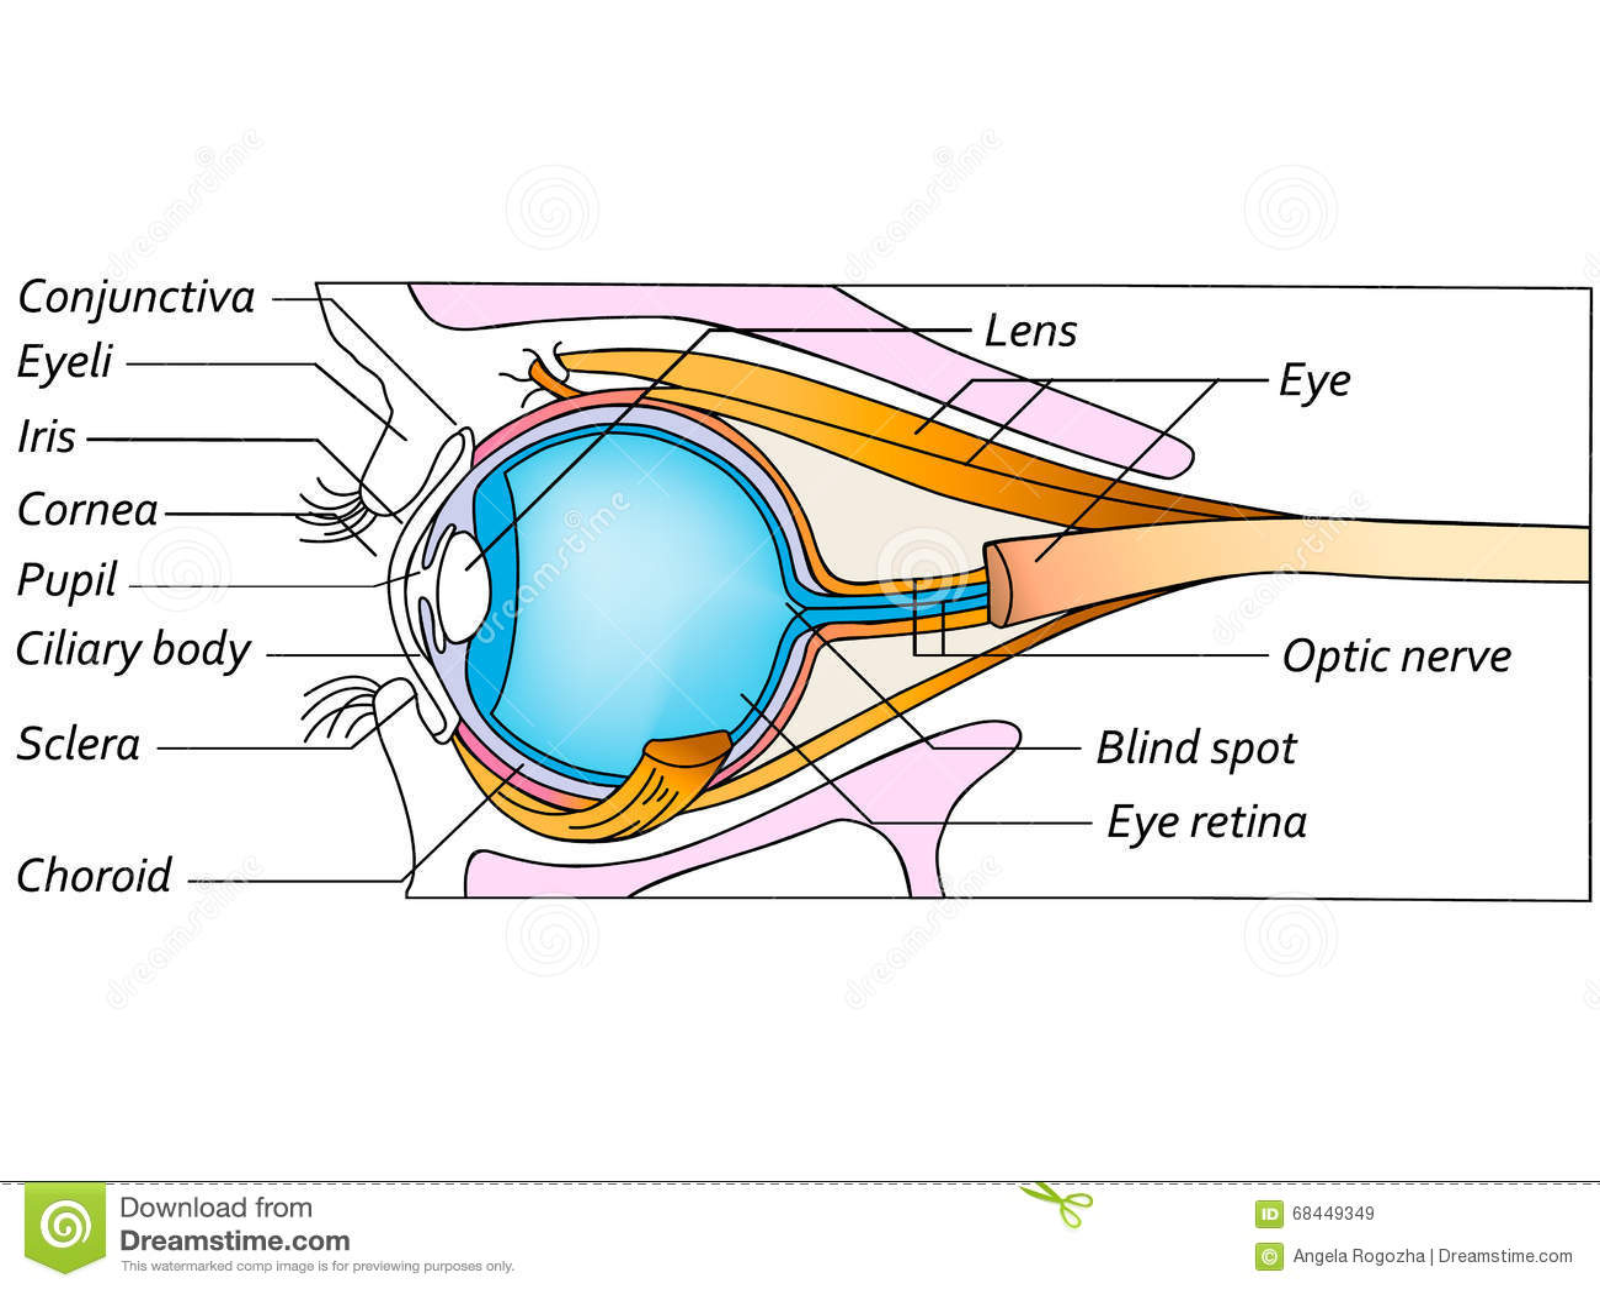 Anatomy Of The Eye Detailed Illustration Stock Illustration